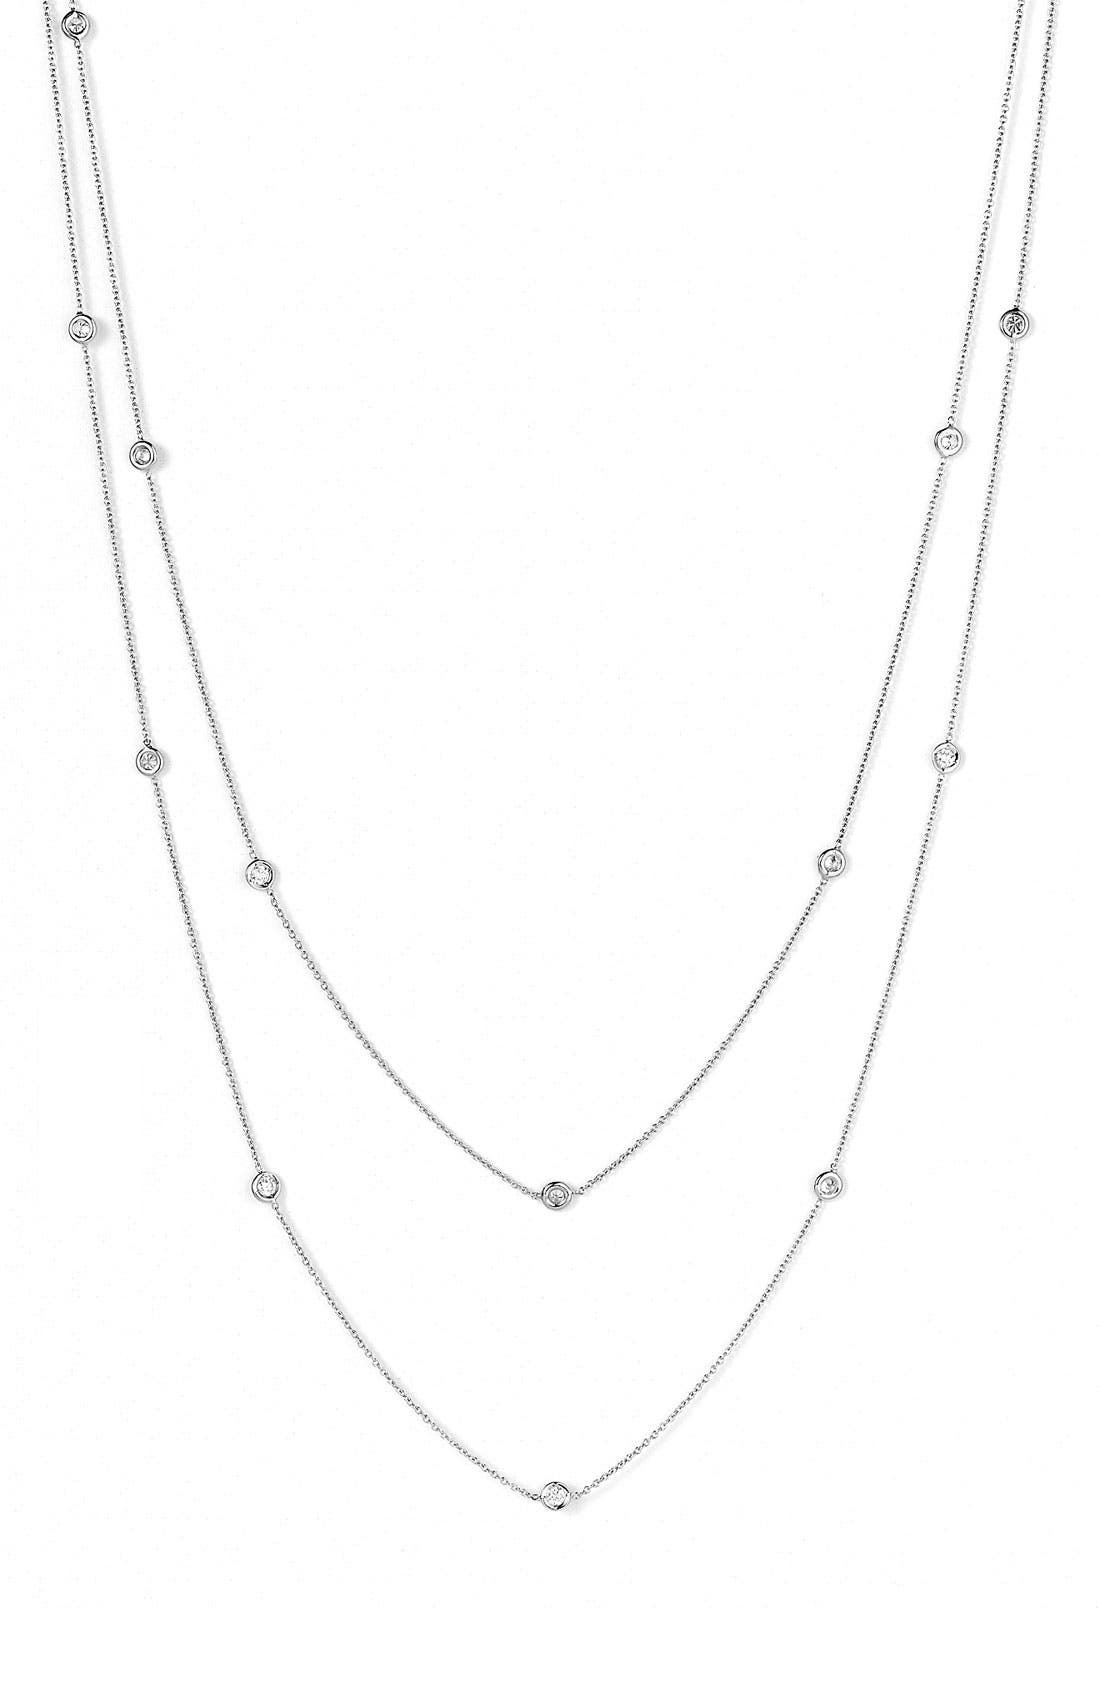 Diamond Station Necklace,                             Alternate thumbnail 3, color,                             White Gold